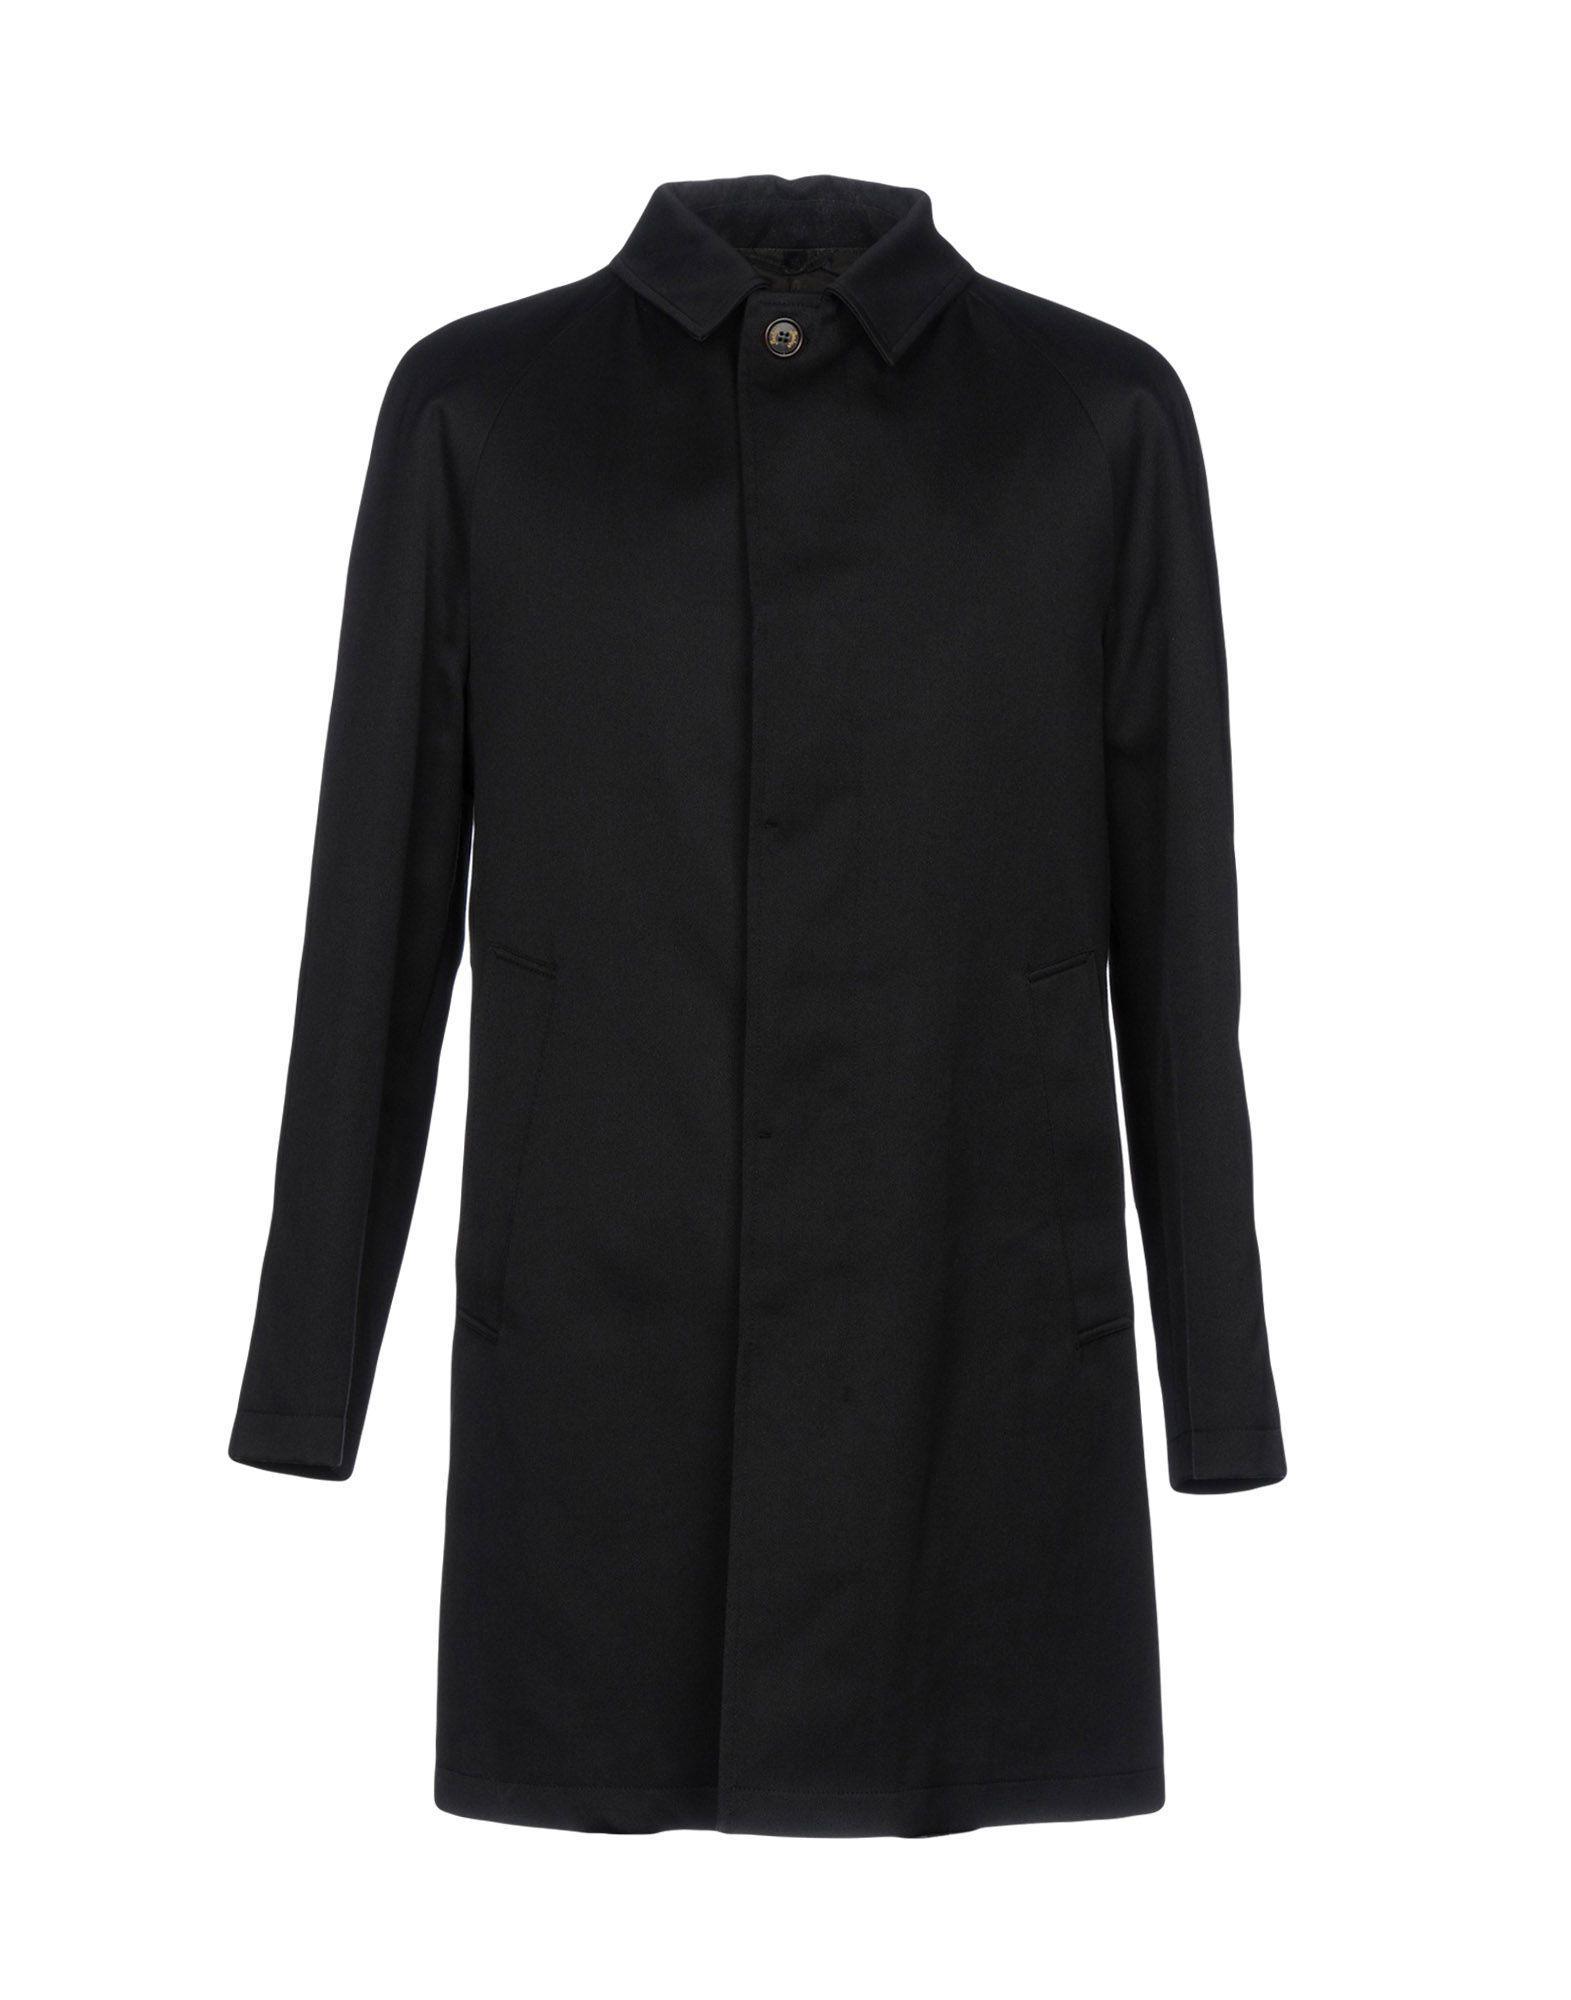 Sealup Full-length Jacket In Black